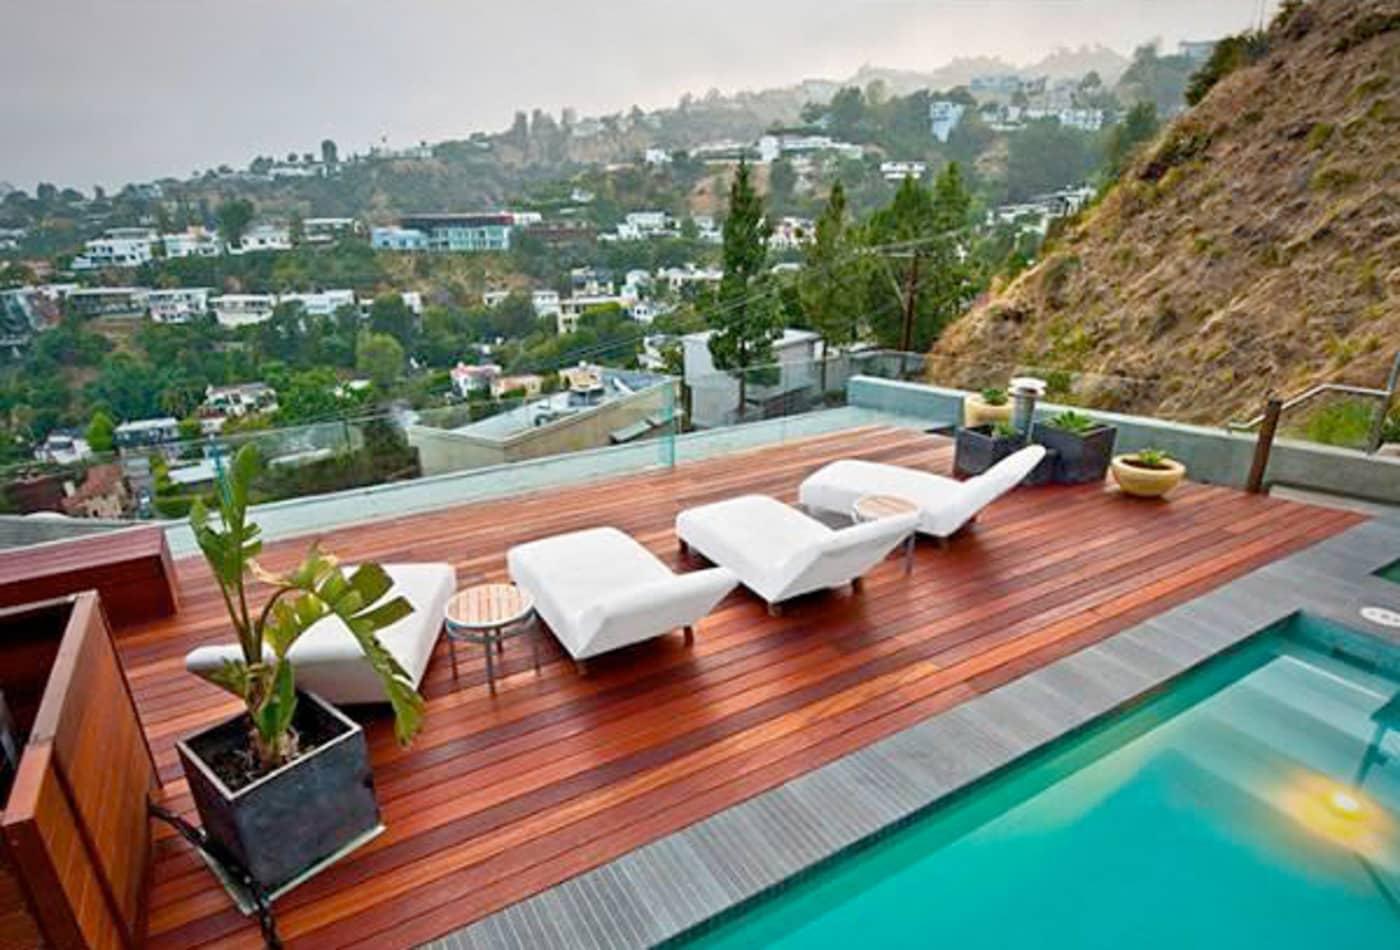 CNBC_extreme_rooftop_LA.jpg